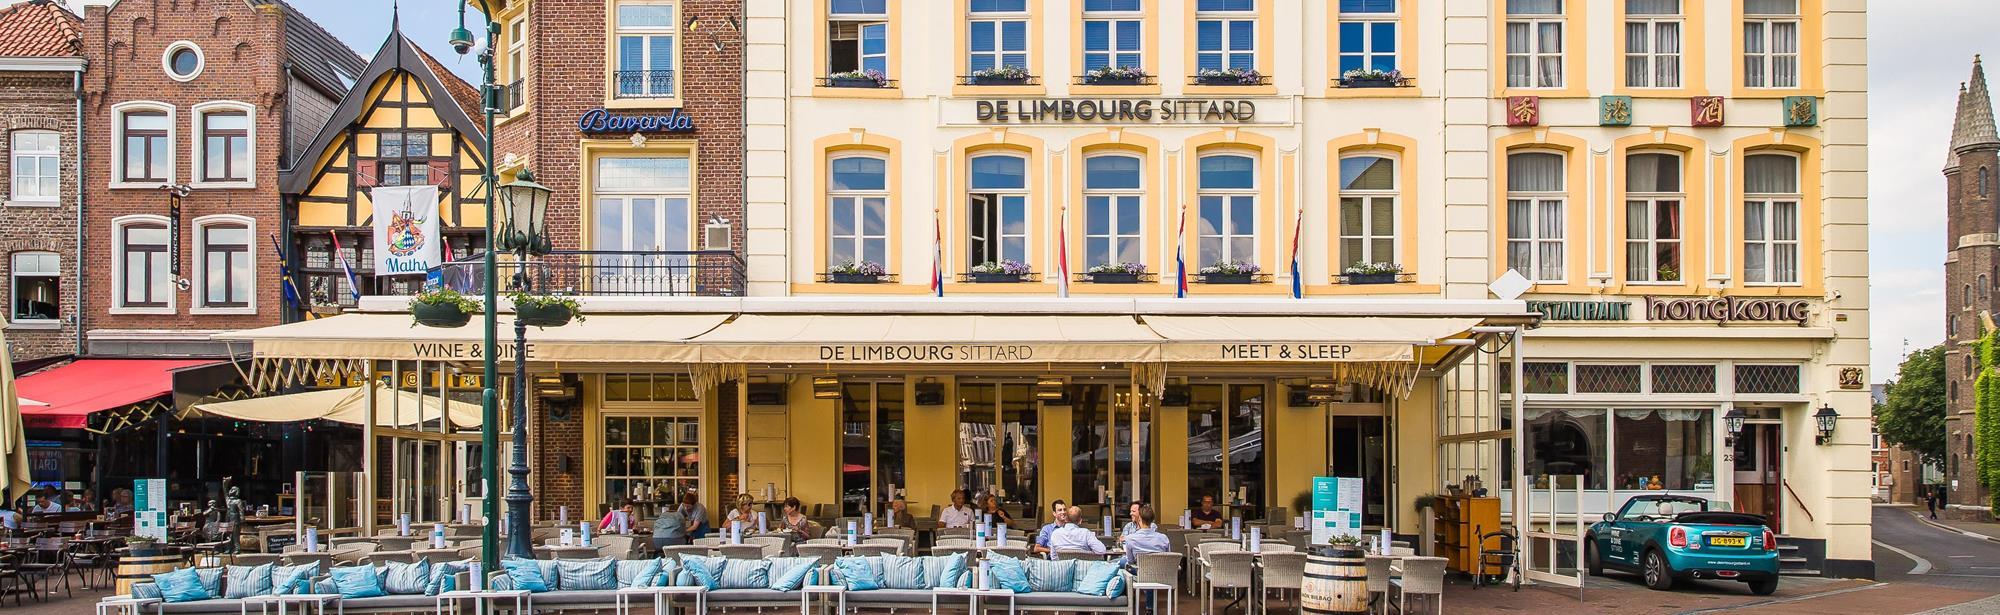 Wine & Dine De Limbourg Sittard